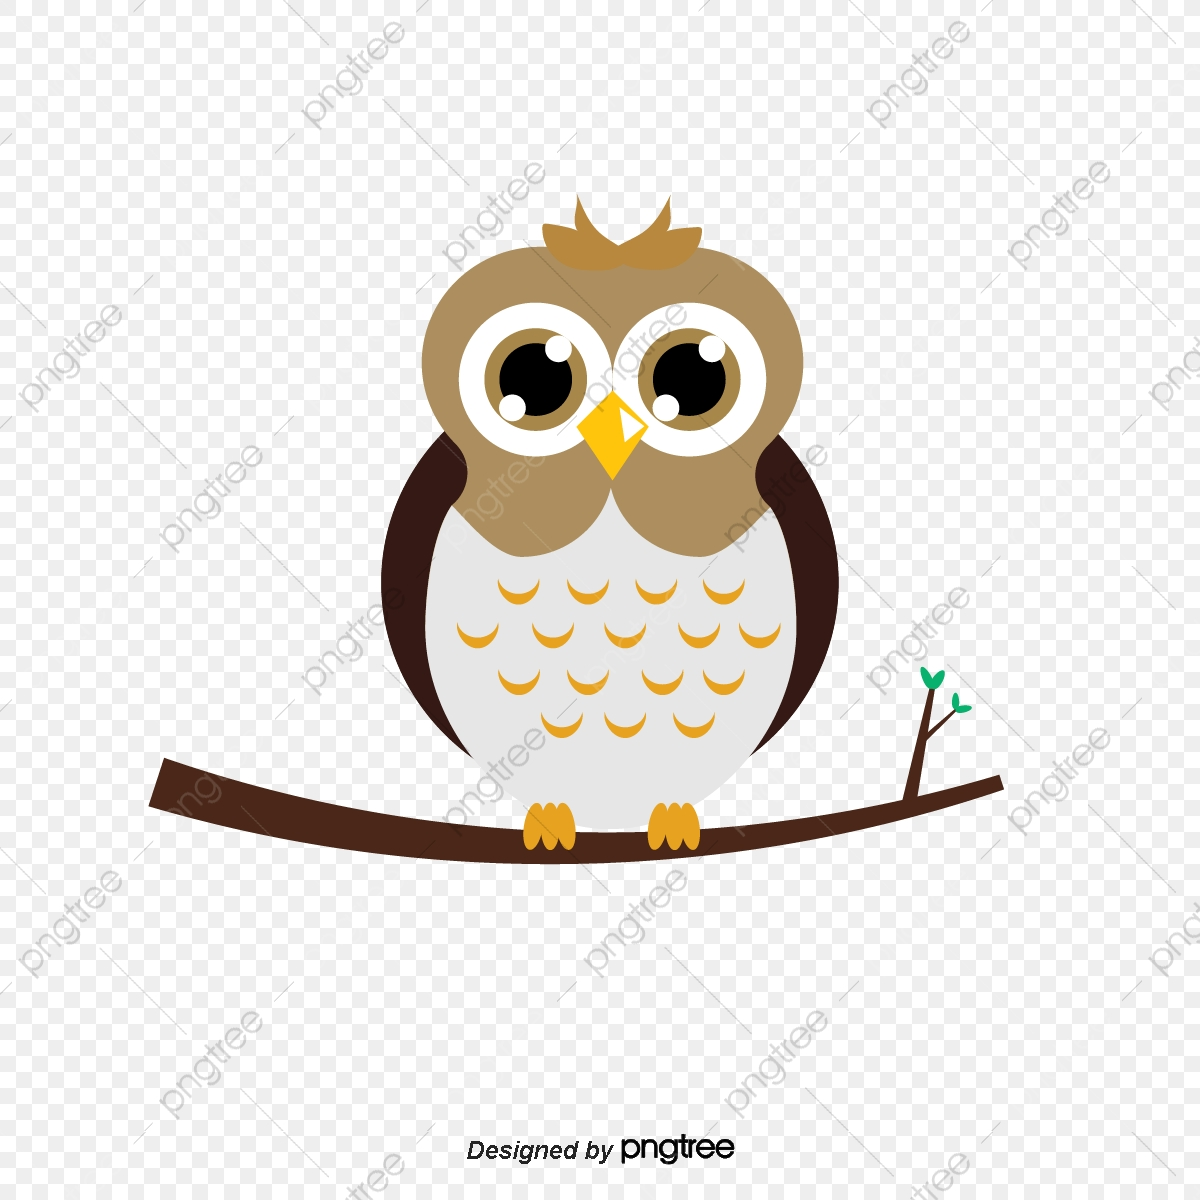 Rata Pada Cabang Burung Hantu Grafik Clip Art Kartun Comel Png